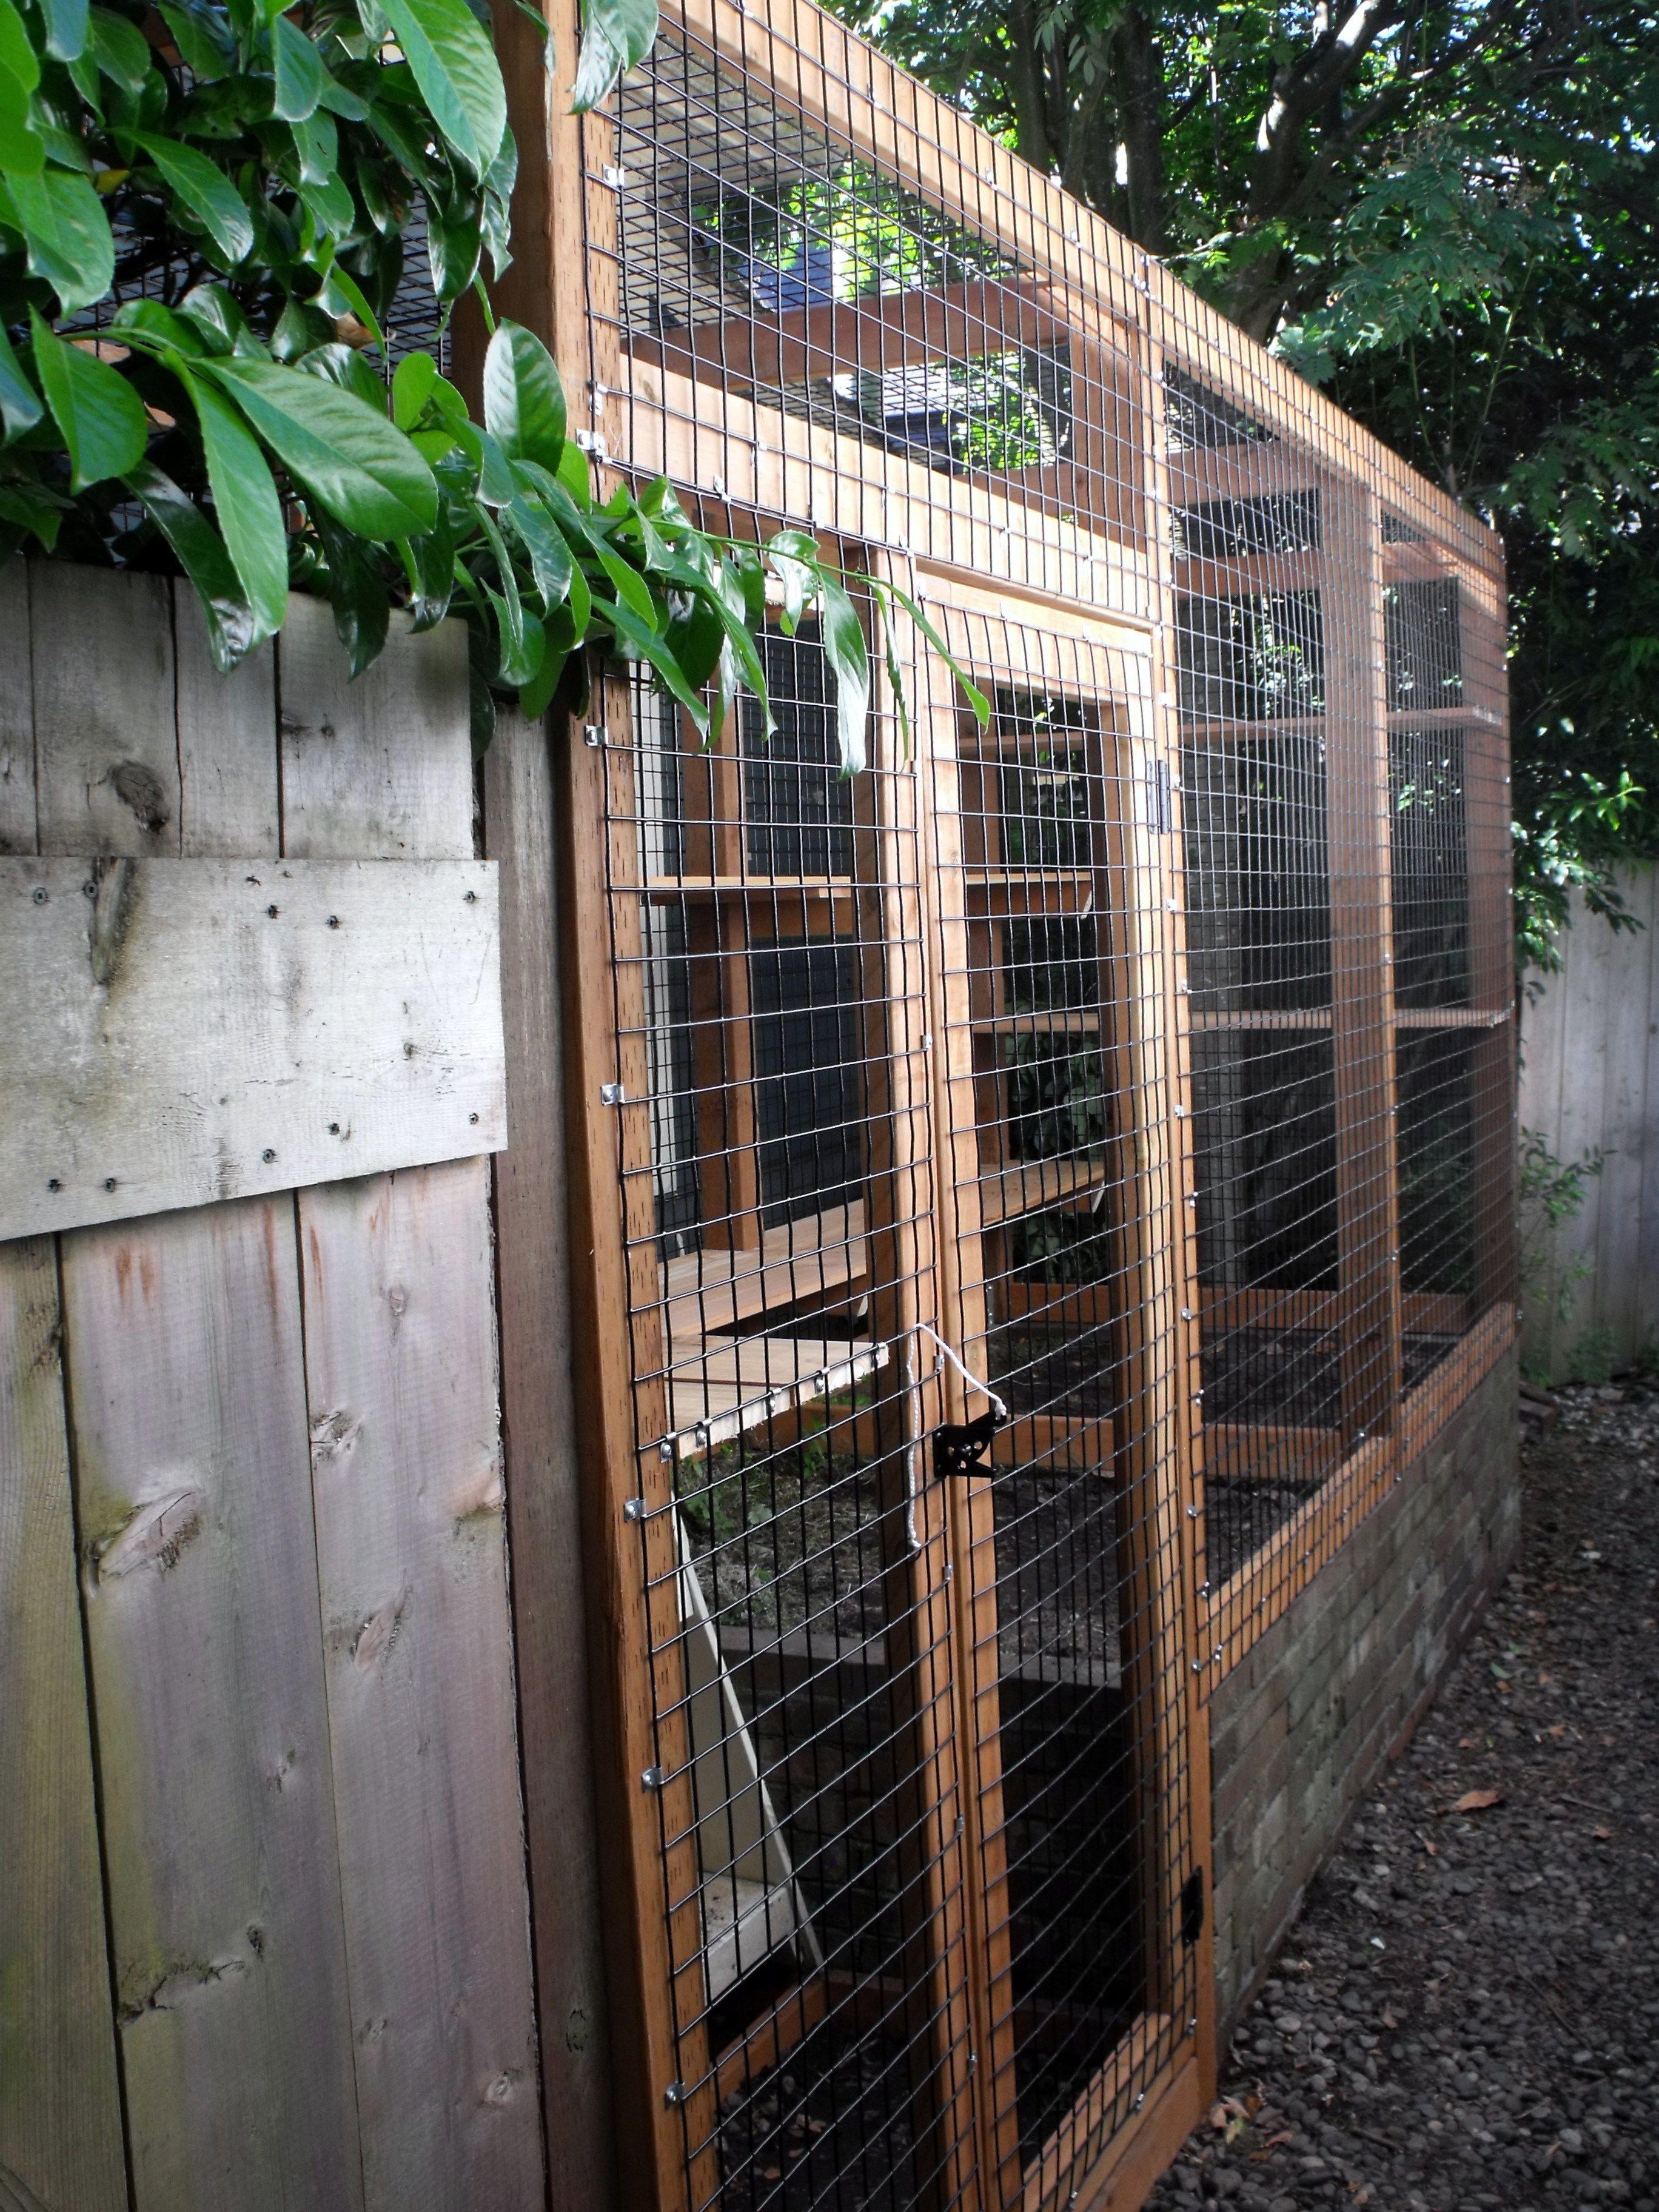 Outdoor Cat Enclosure Beautiful World Living Environments Www.abeautifulwor.